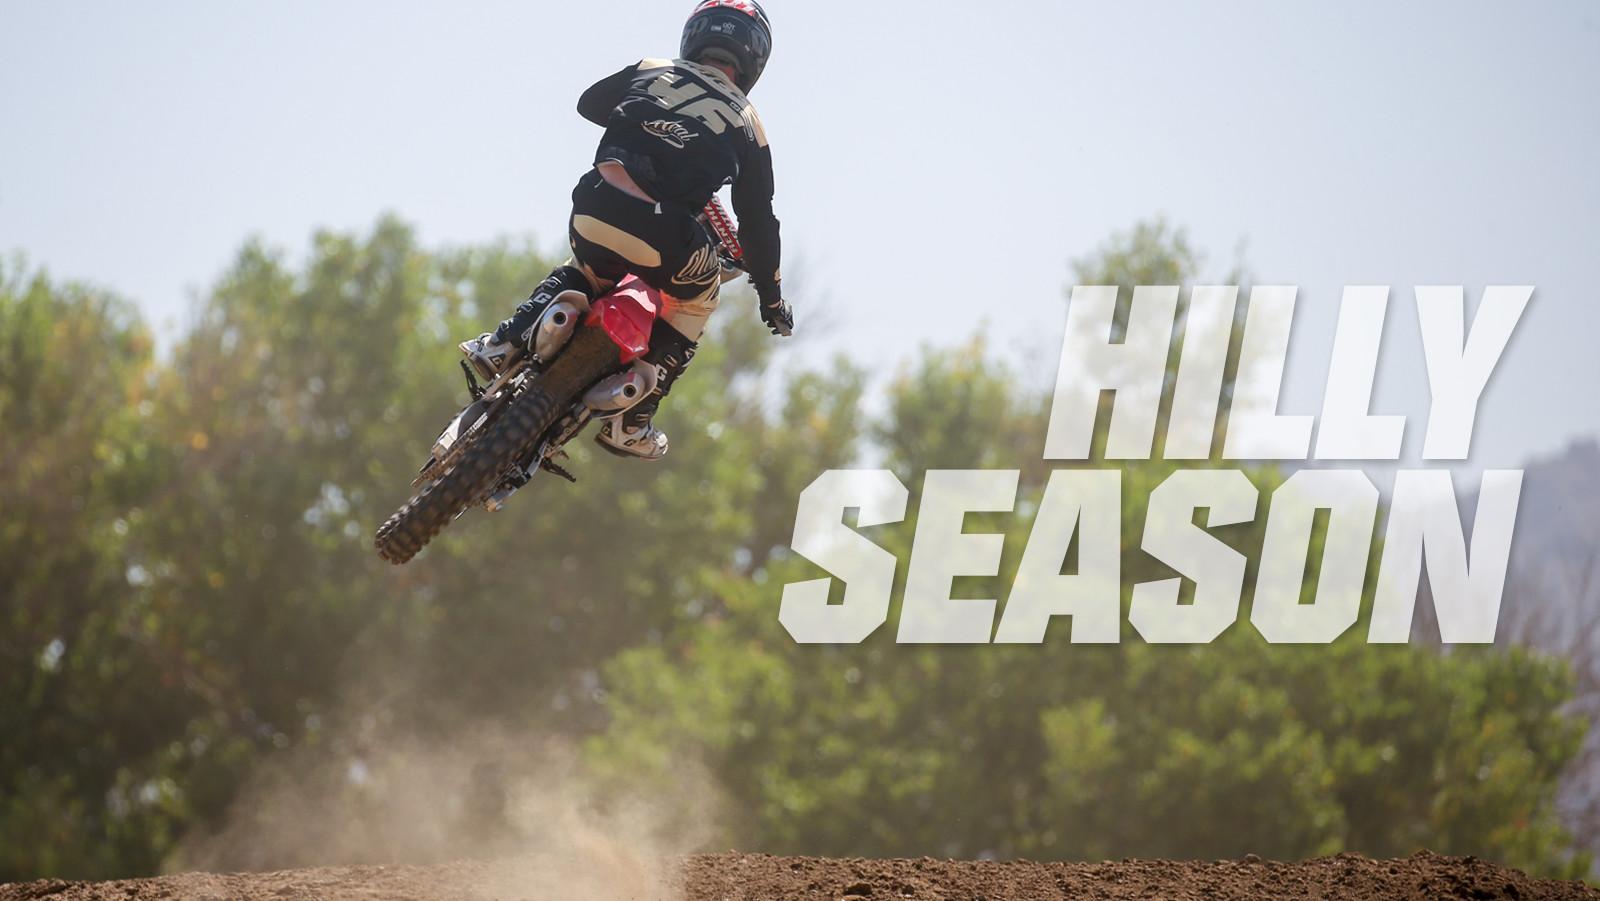 Hilly Season